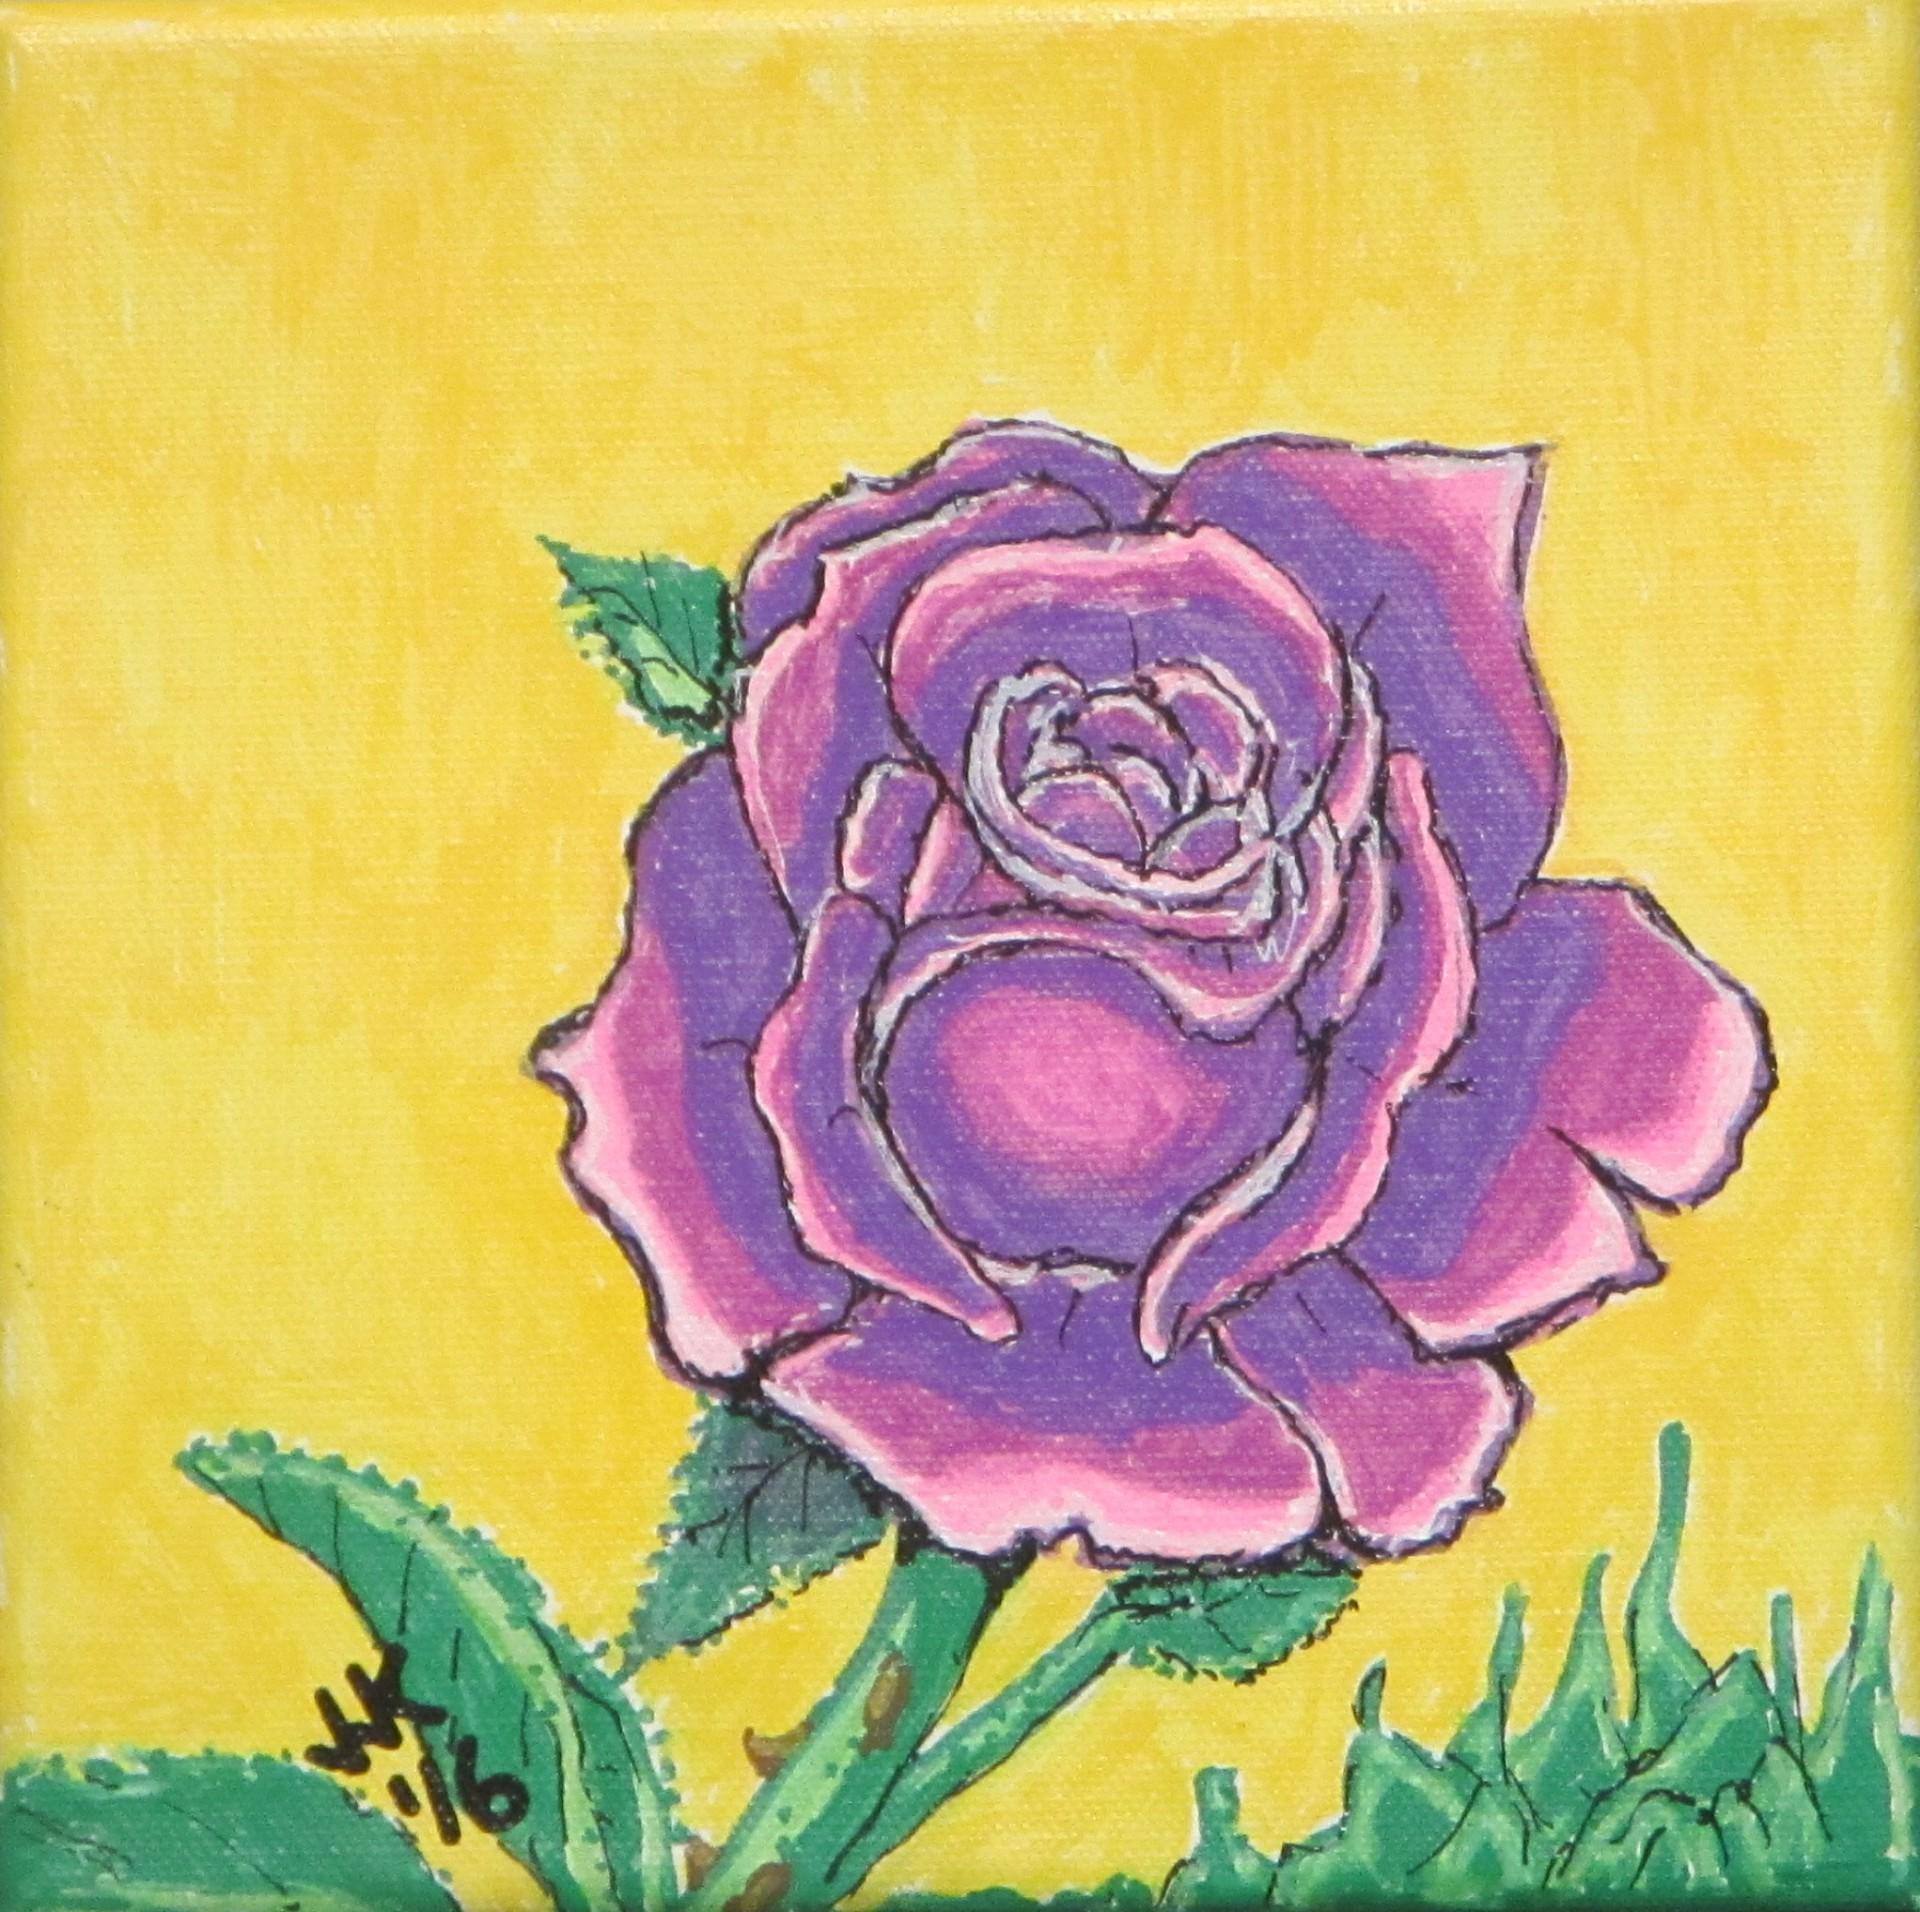 A purple rose.